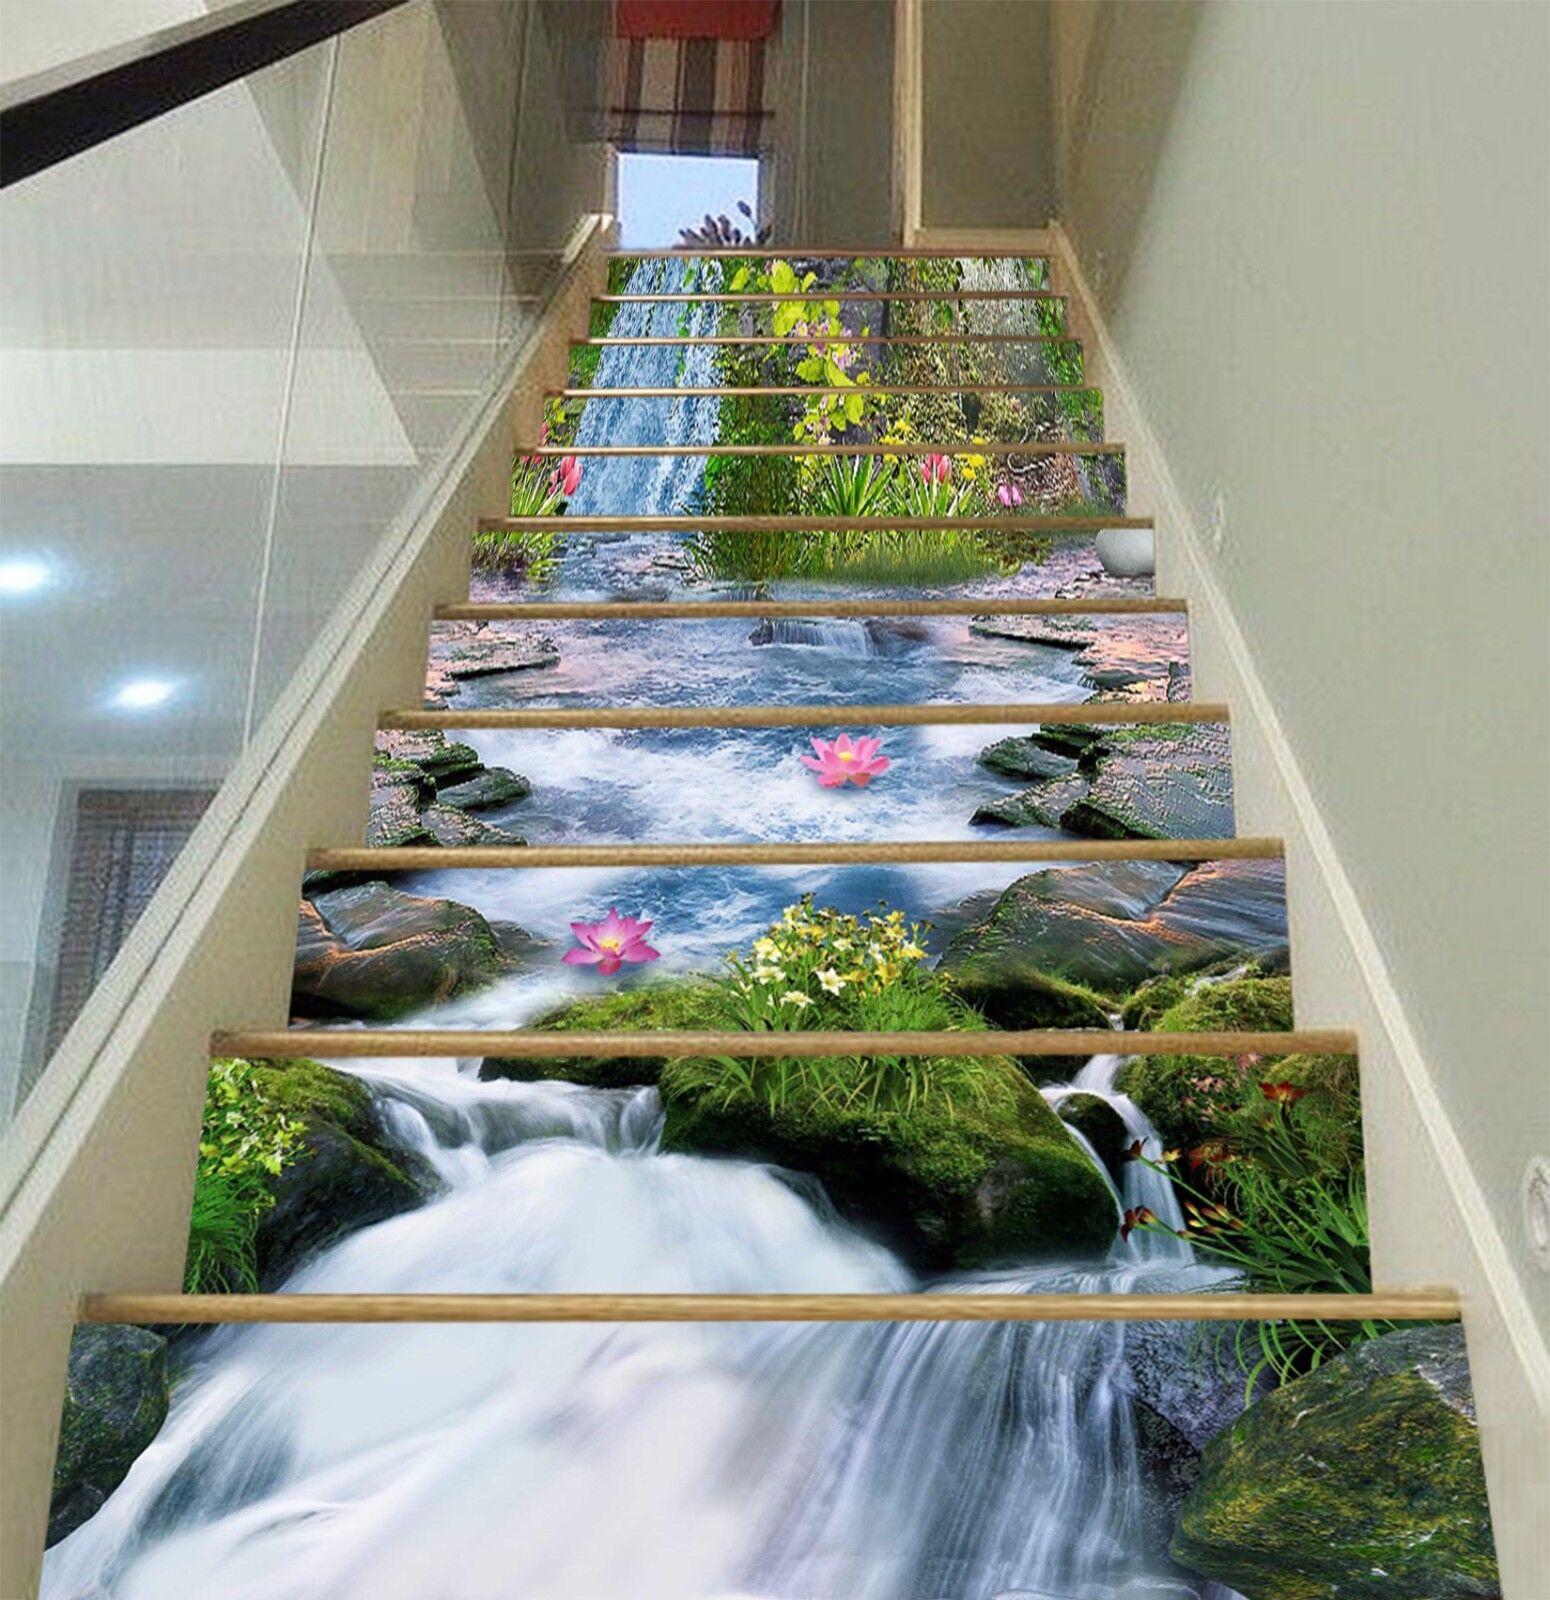 3D Lotus Plants 583 Risers Decoration Photo Mural Vinyl Decal Wallpaper CA